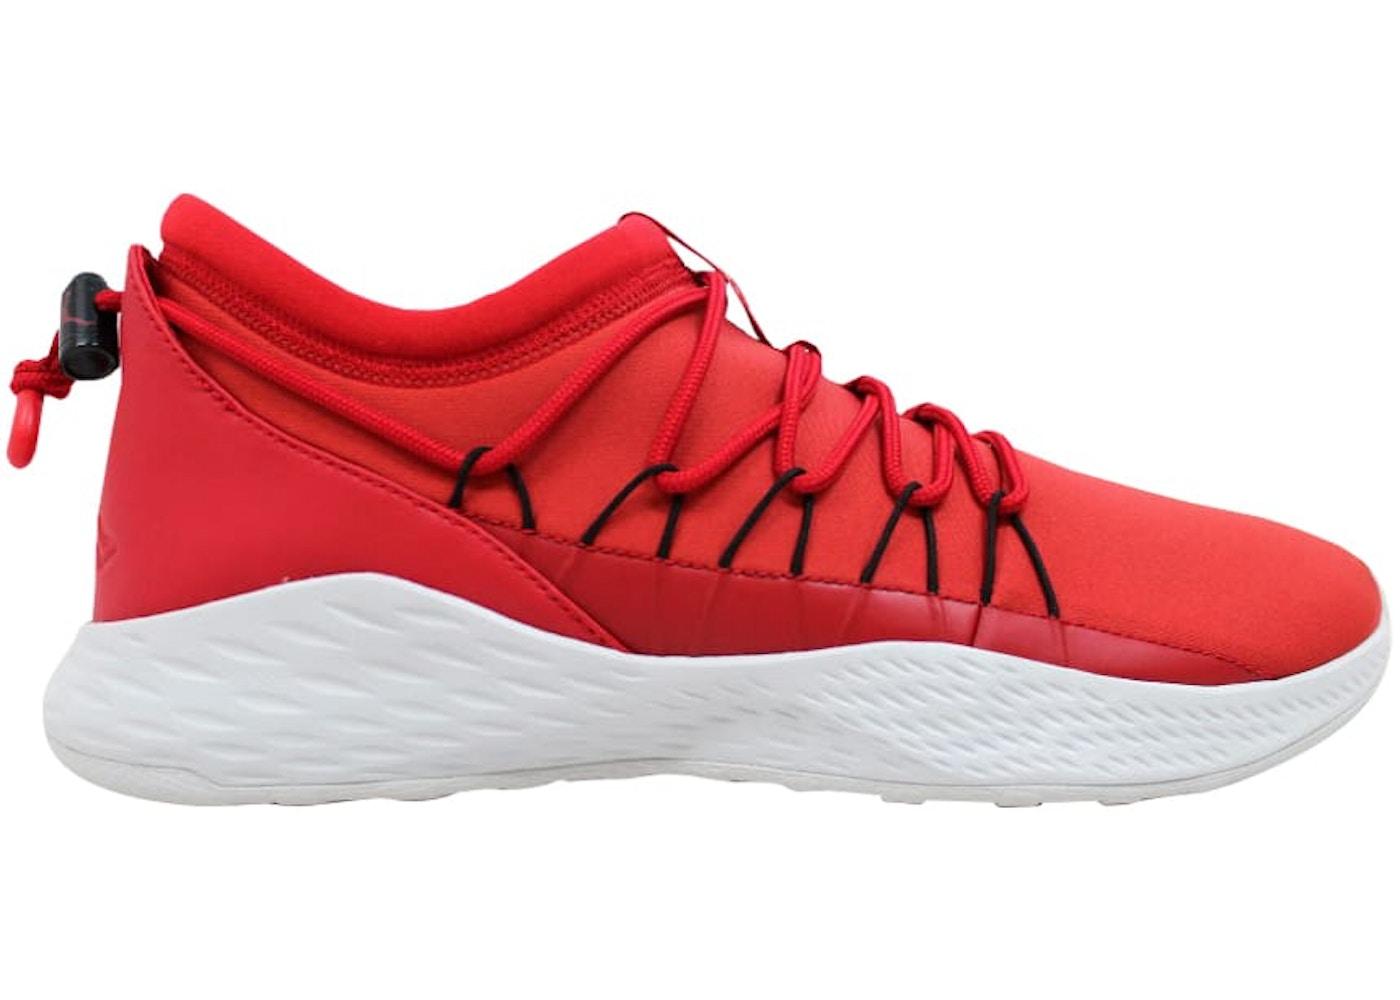 1ff4b7e05b2 Air Jordan Formula 23 Toggle Gym Red/Black-Pure Platinum